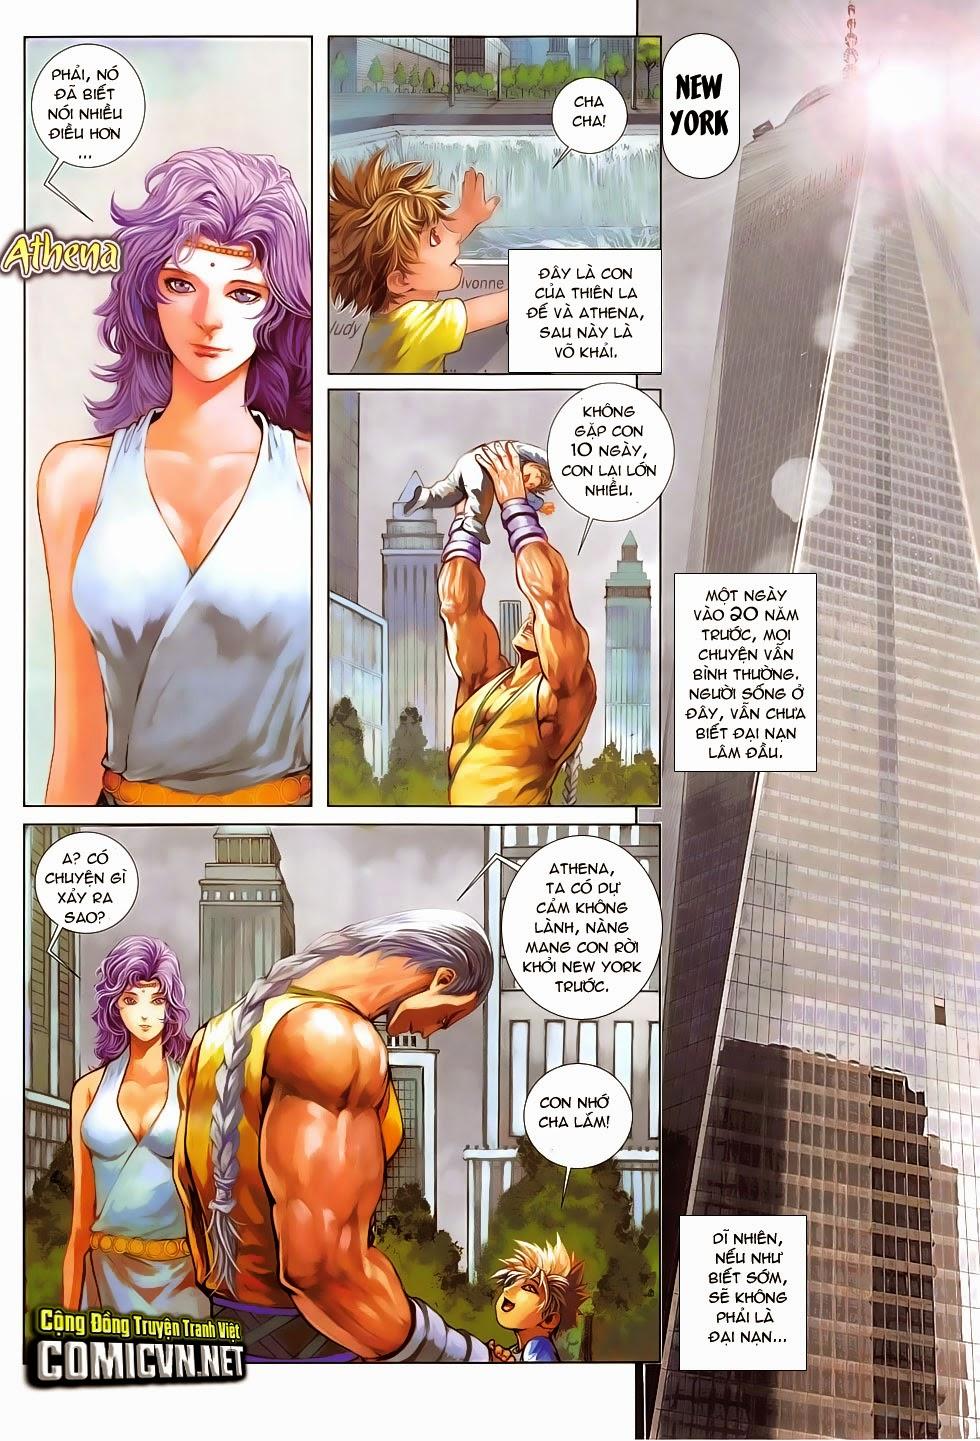 Ba Động Quyền Z Hadouken Zero chap 15 - Trang 5